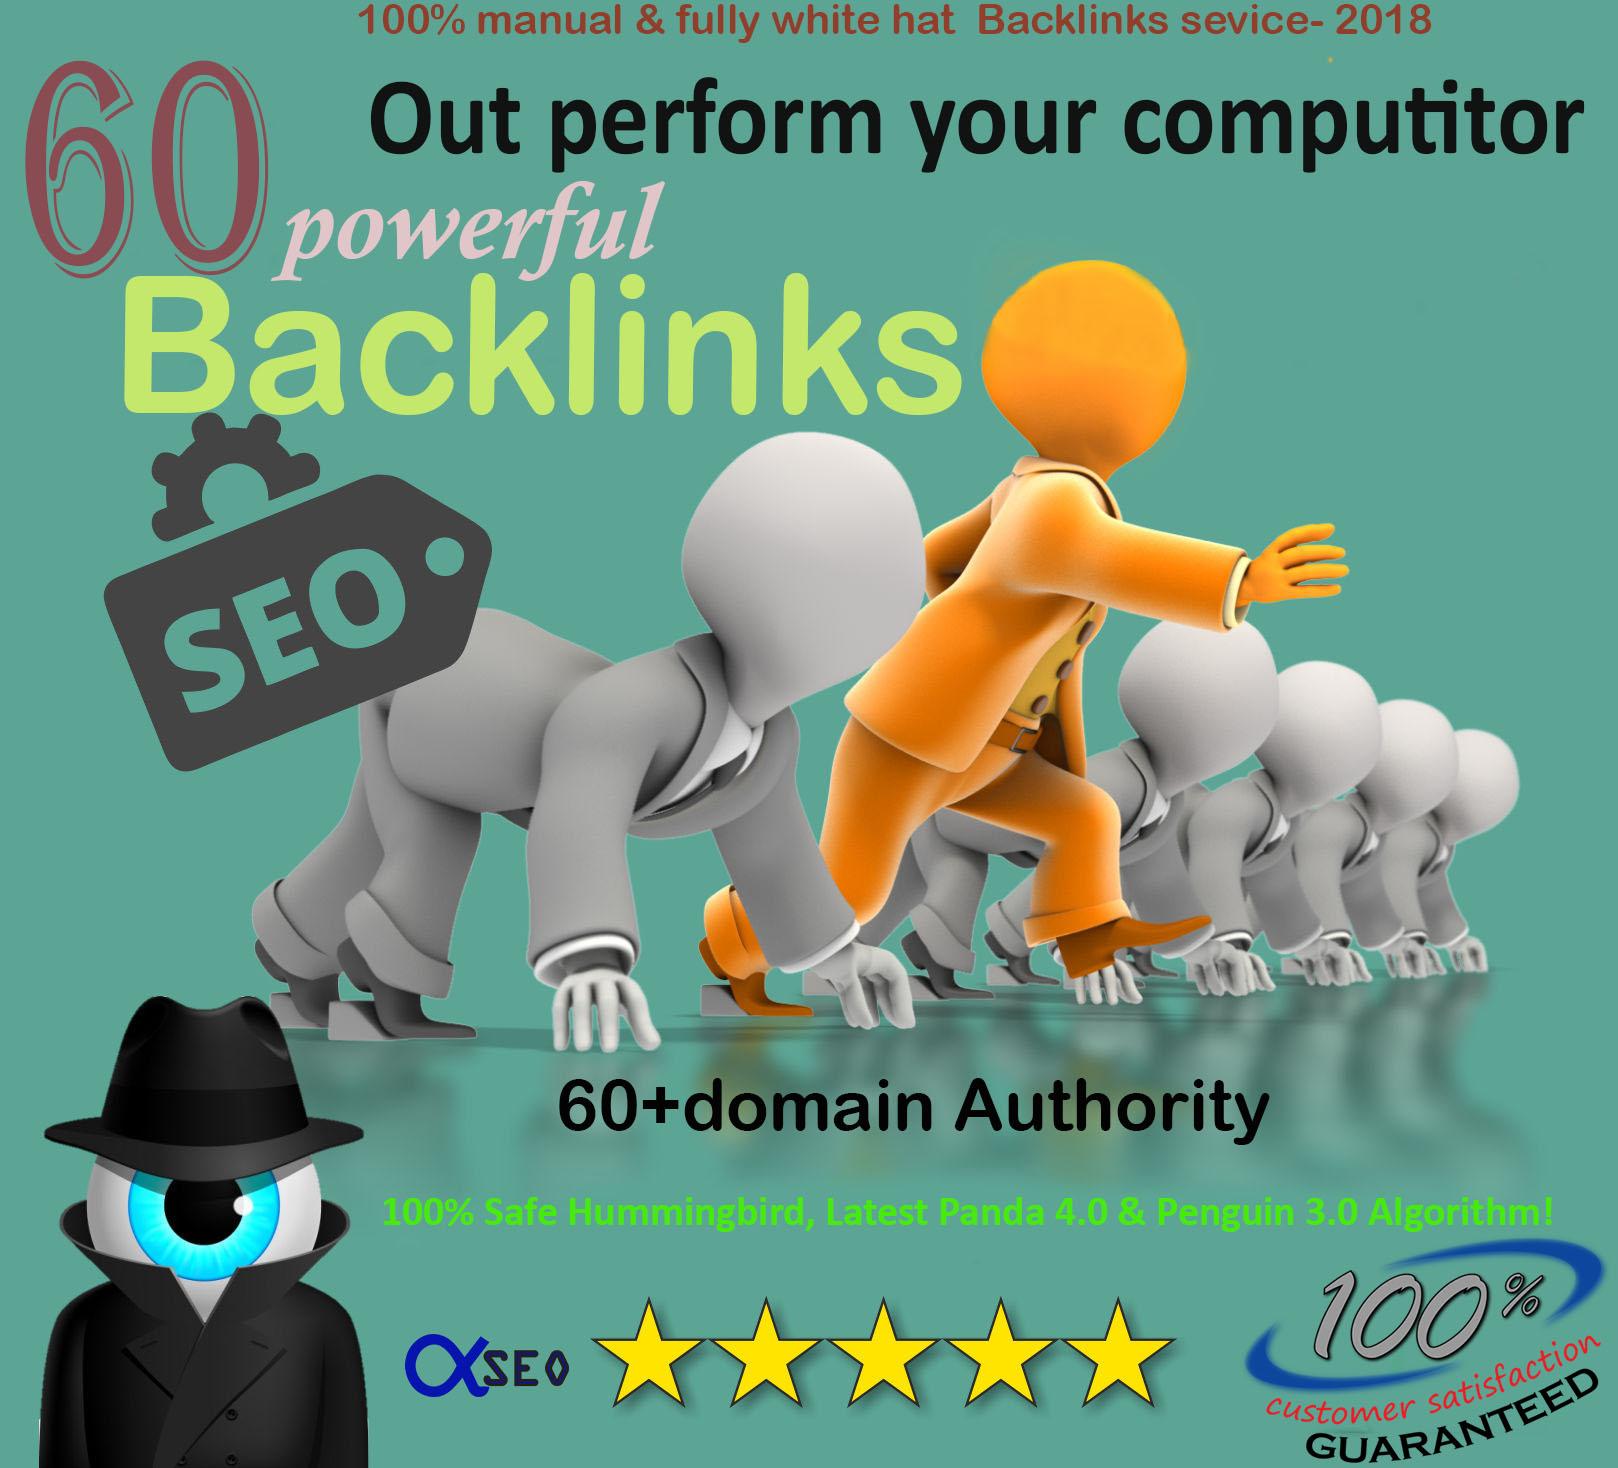 Latest 60 PR9 80+DA Safe SEO Powerful Backlinks Increase Your Google & others SERP rank